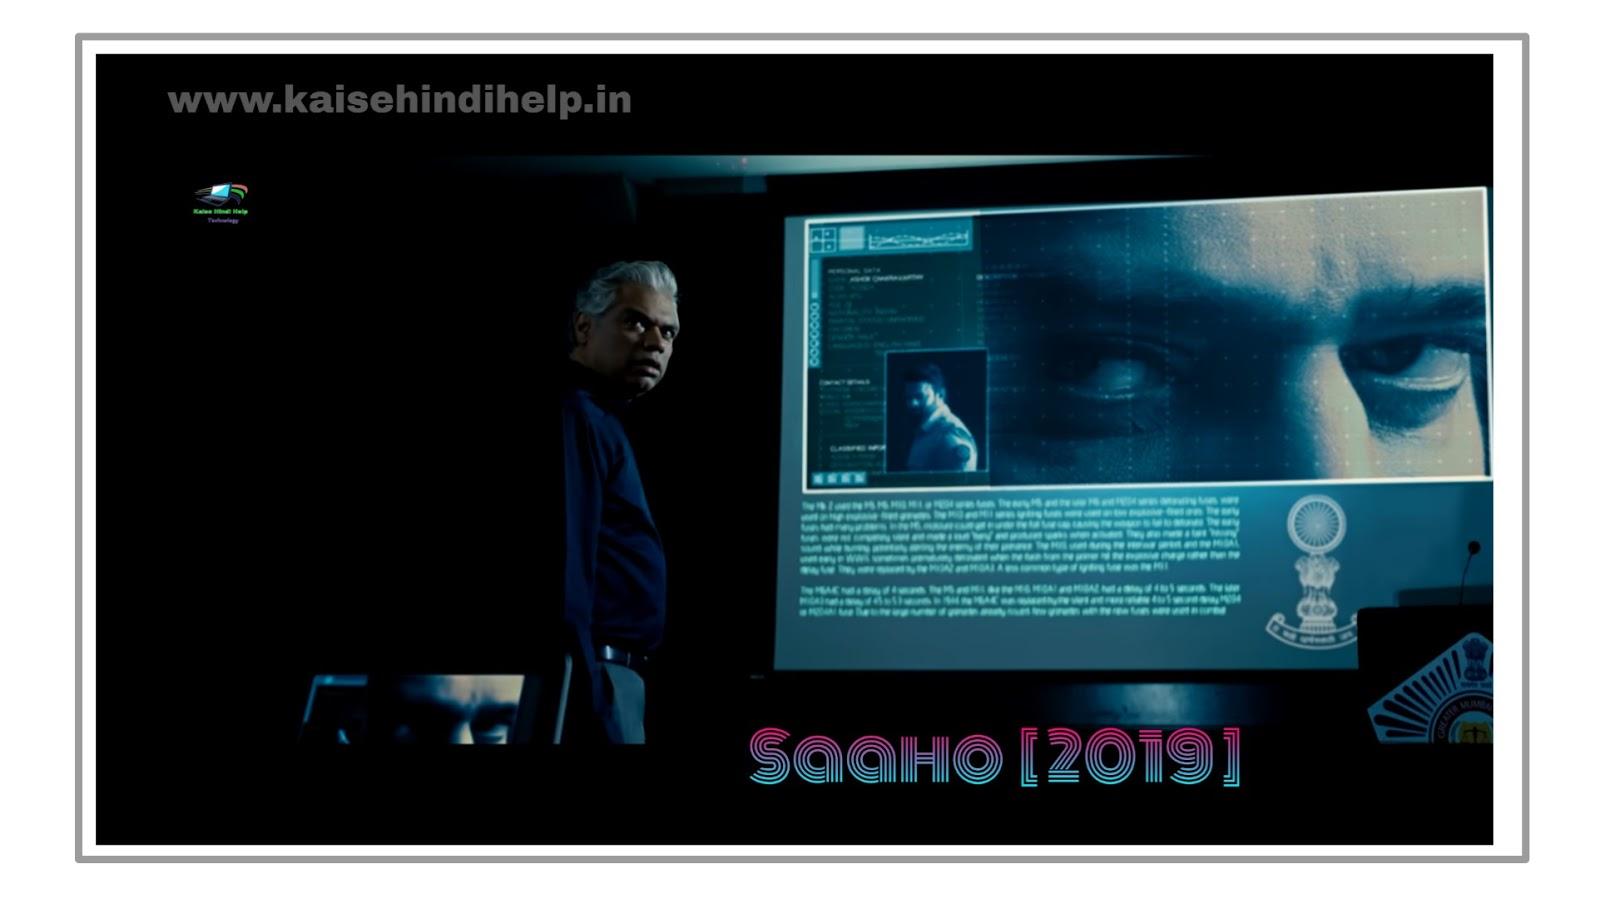 Saaho Full Movie Download In Hindi 1080p